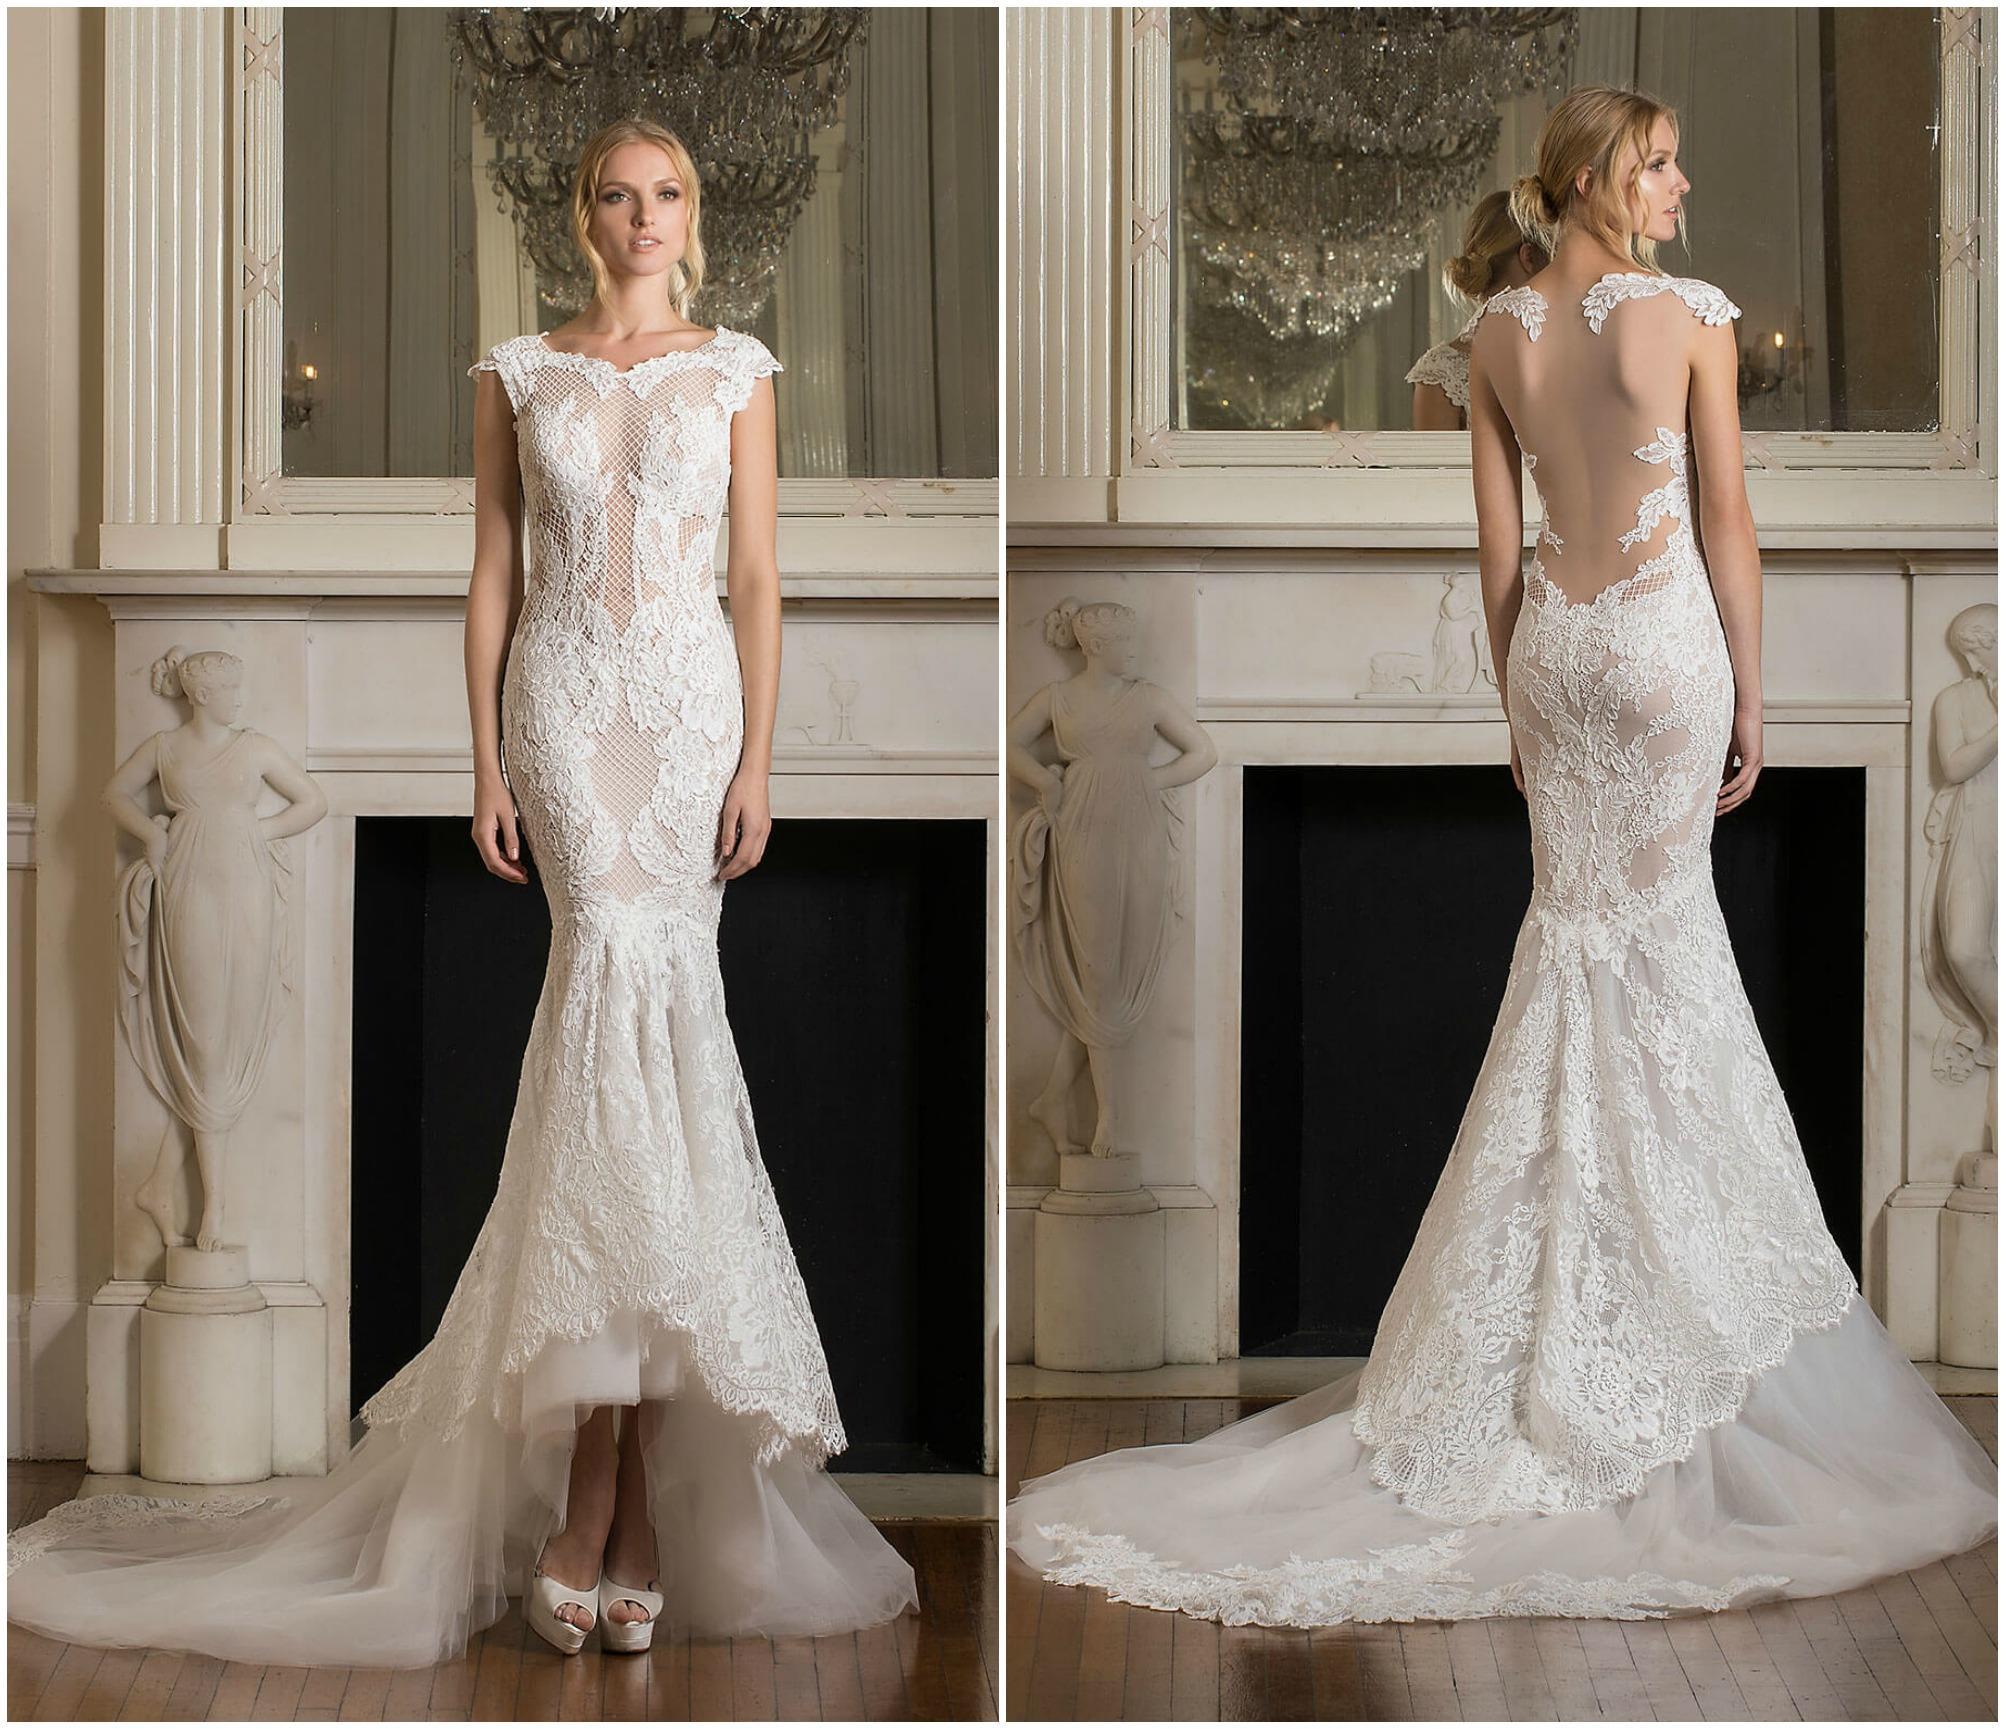 Pnina Tornai Reveals This Spring's Biggest Bridal Trends